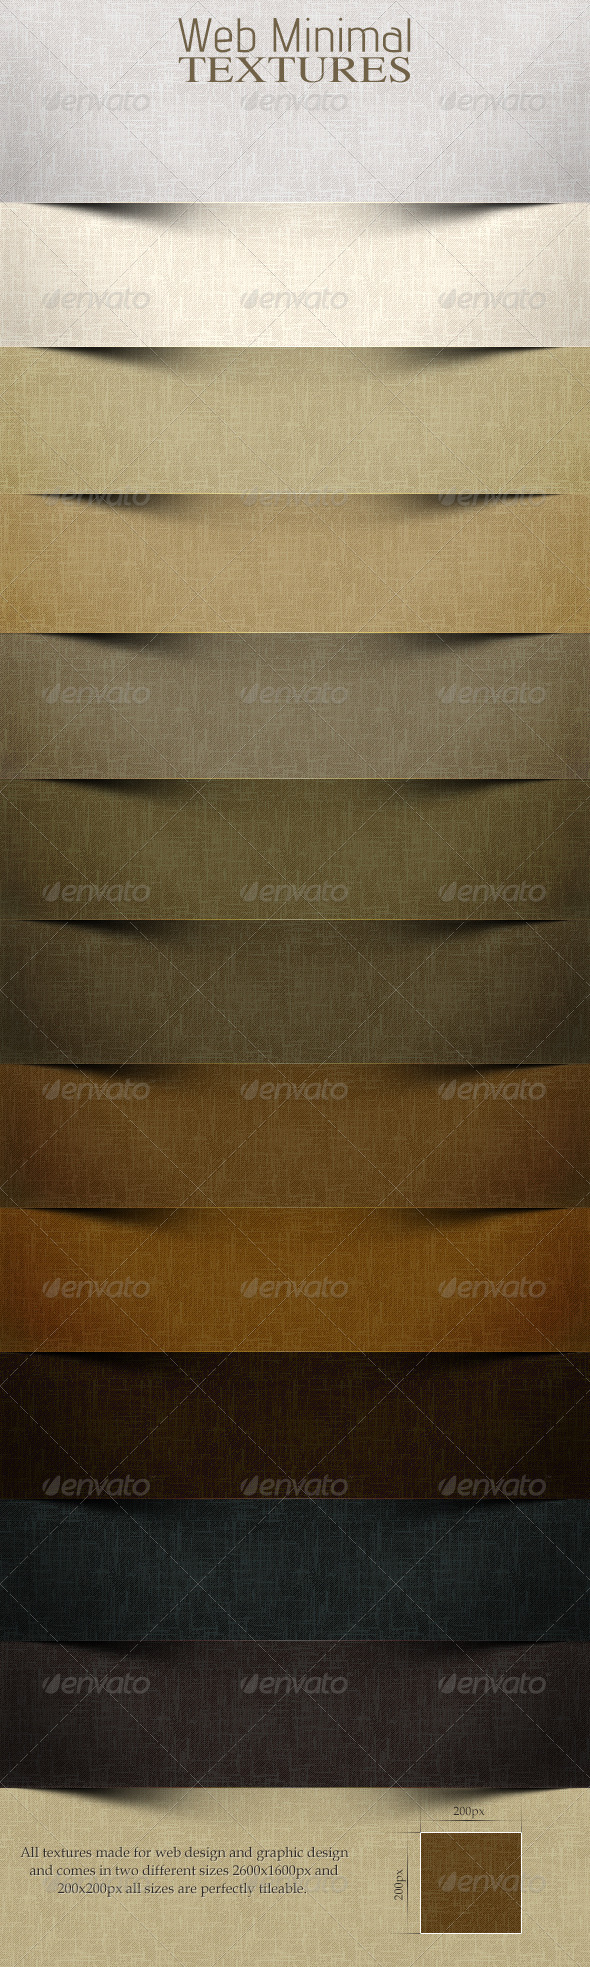 Web Minimal Textures 2.0 - Paper Textures